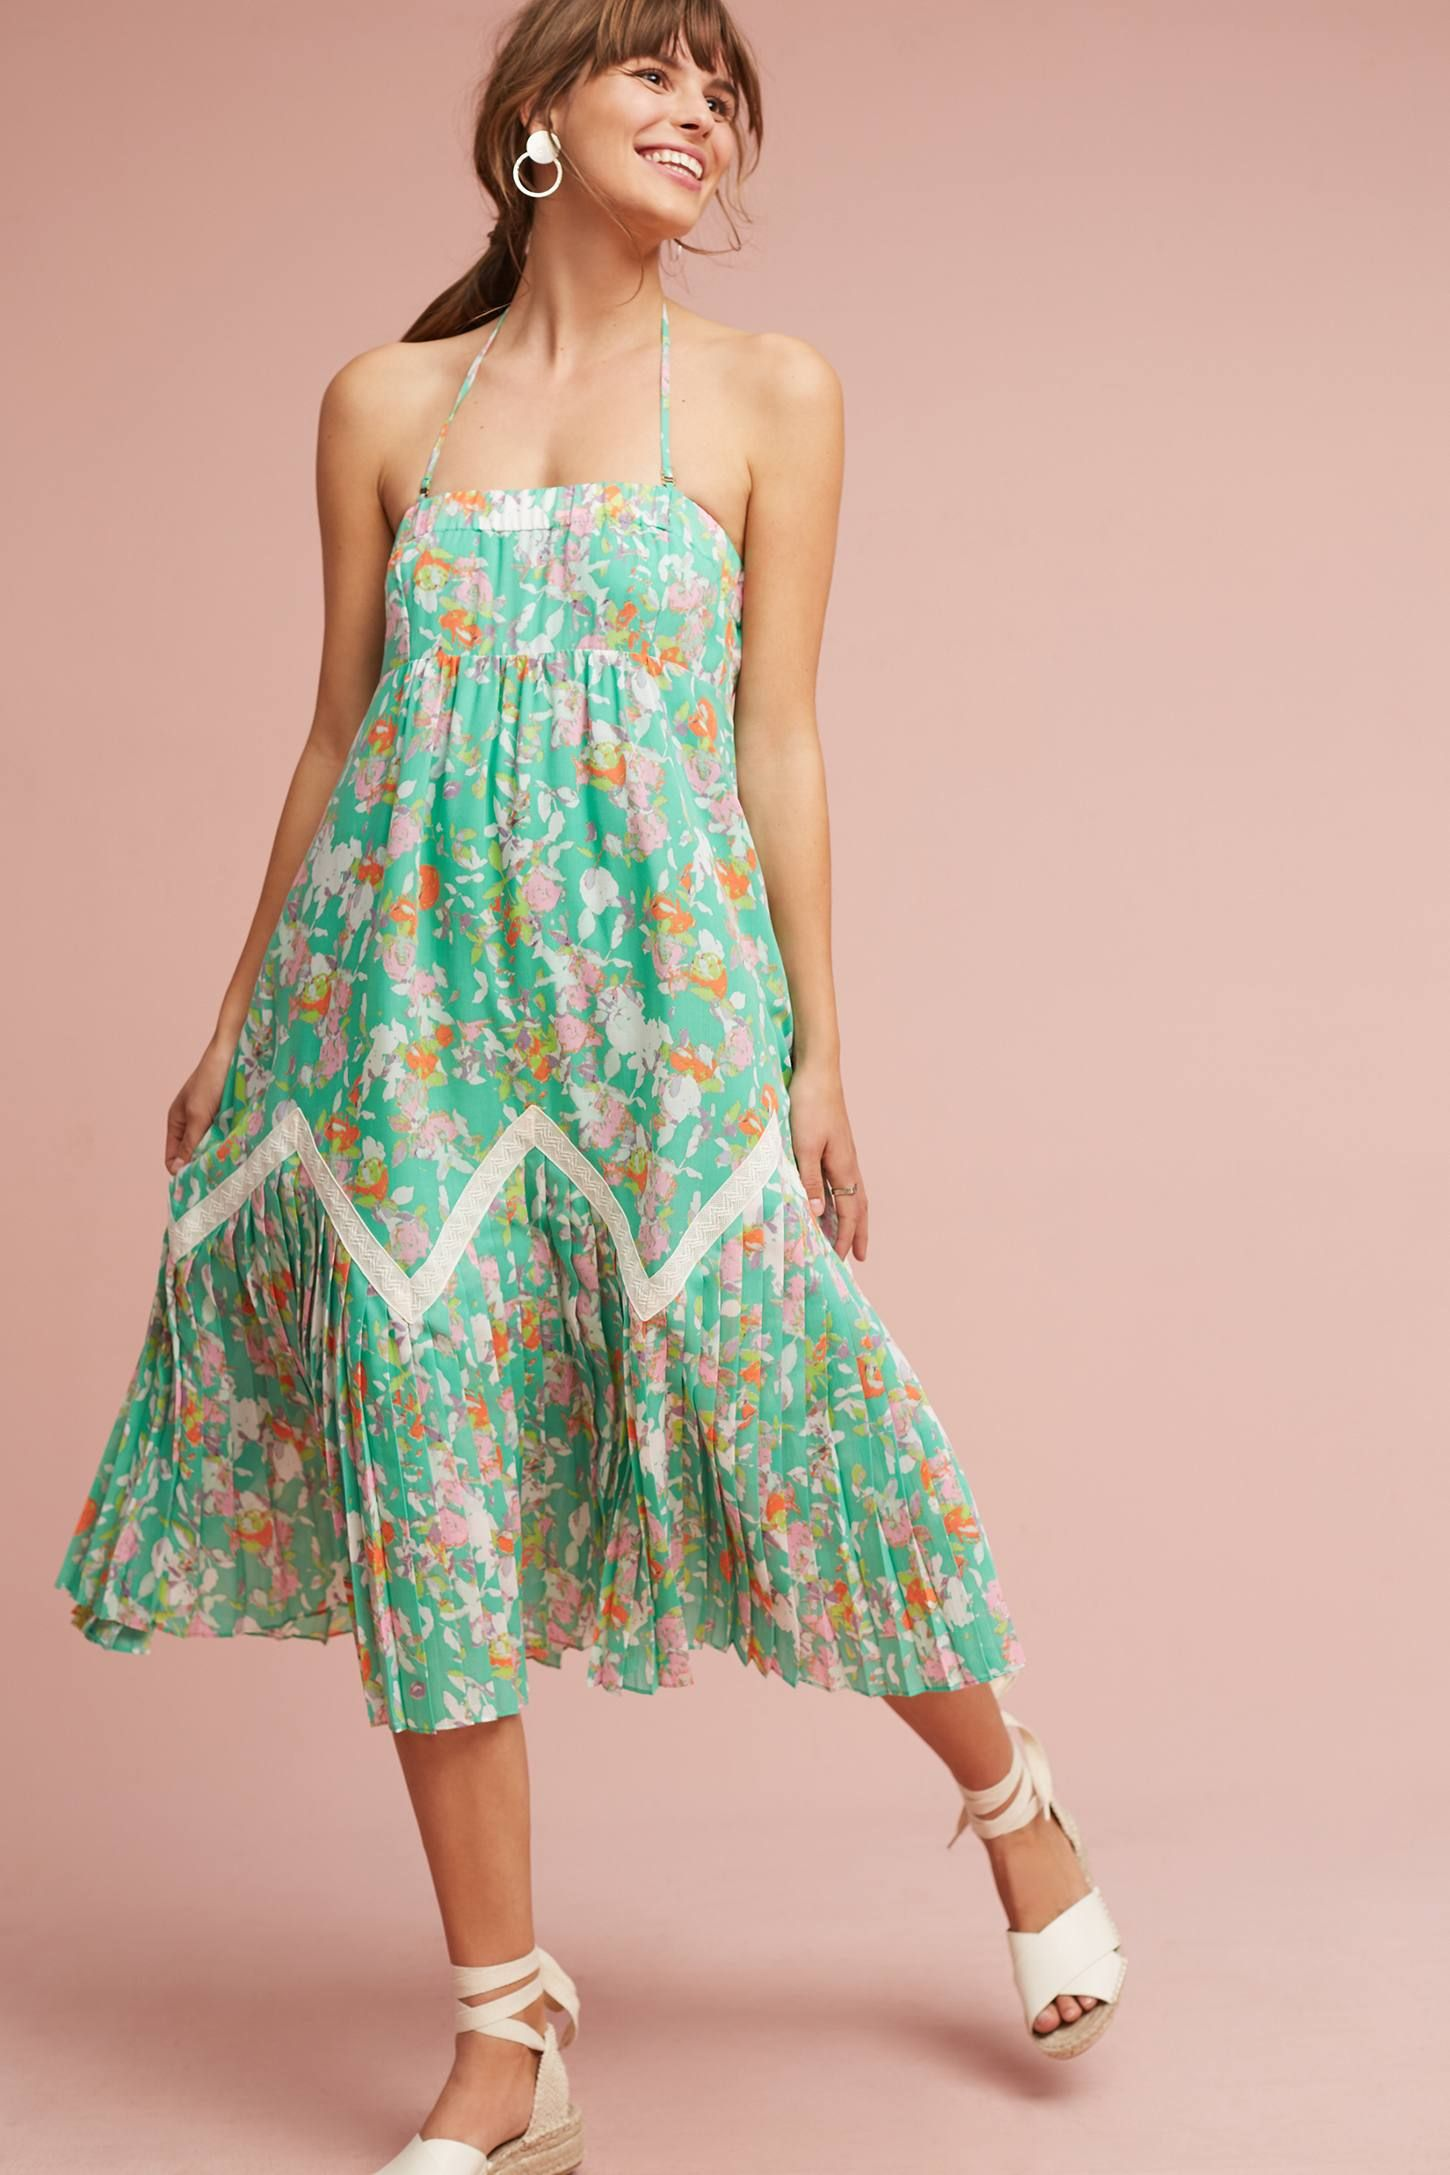 San Sebastian Dress Dresses, Fashion, Romper with skirt